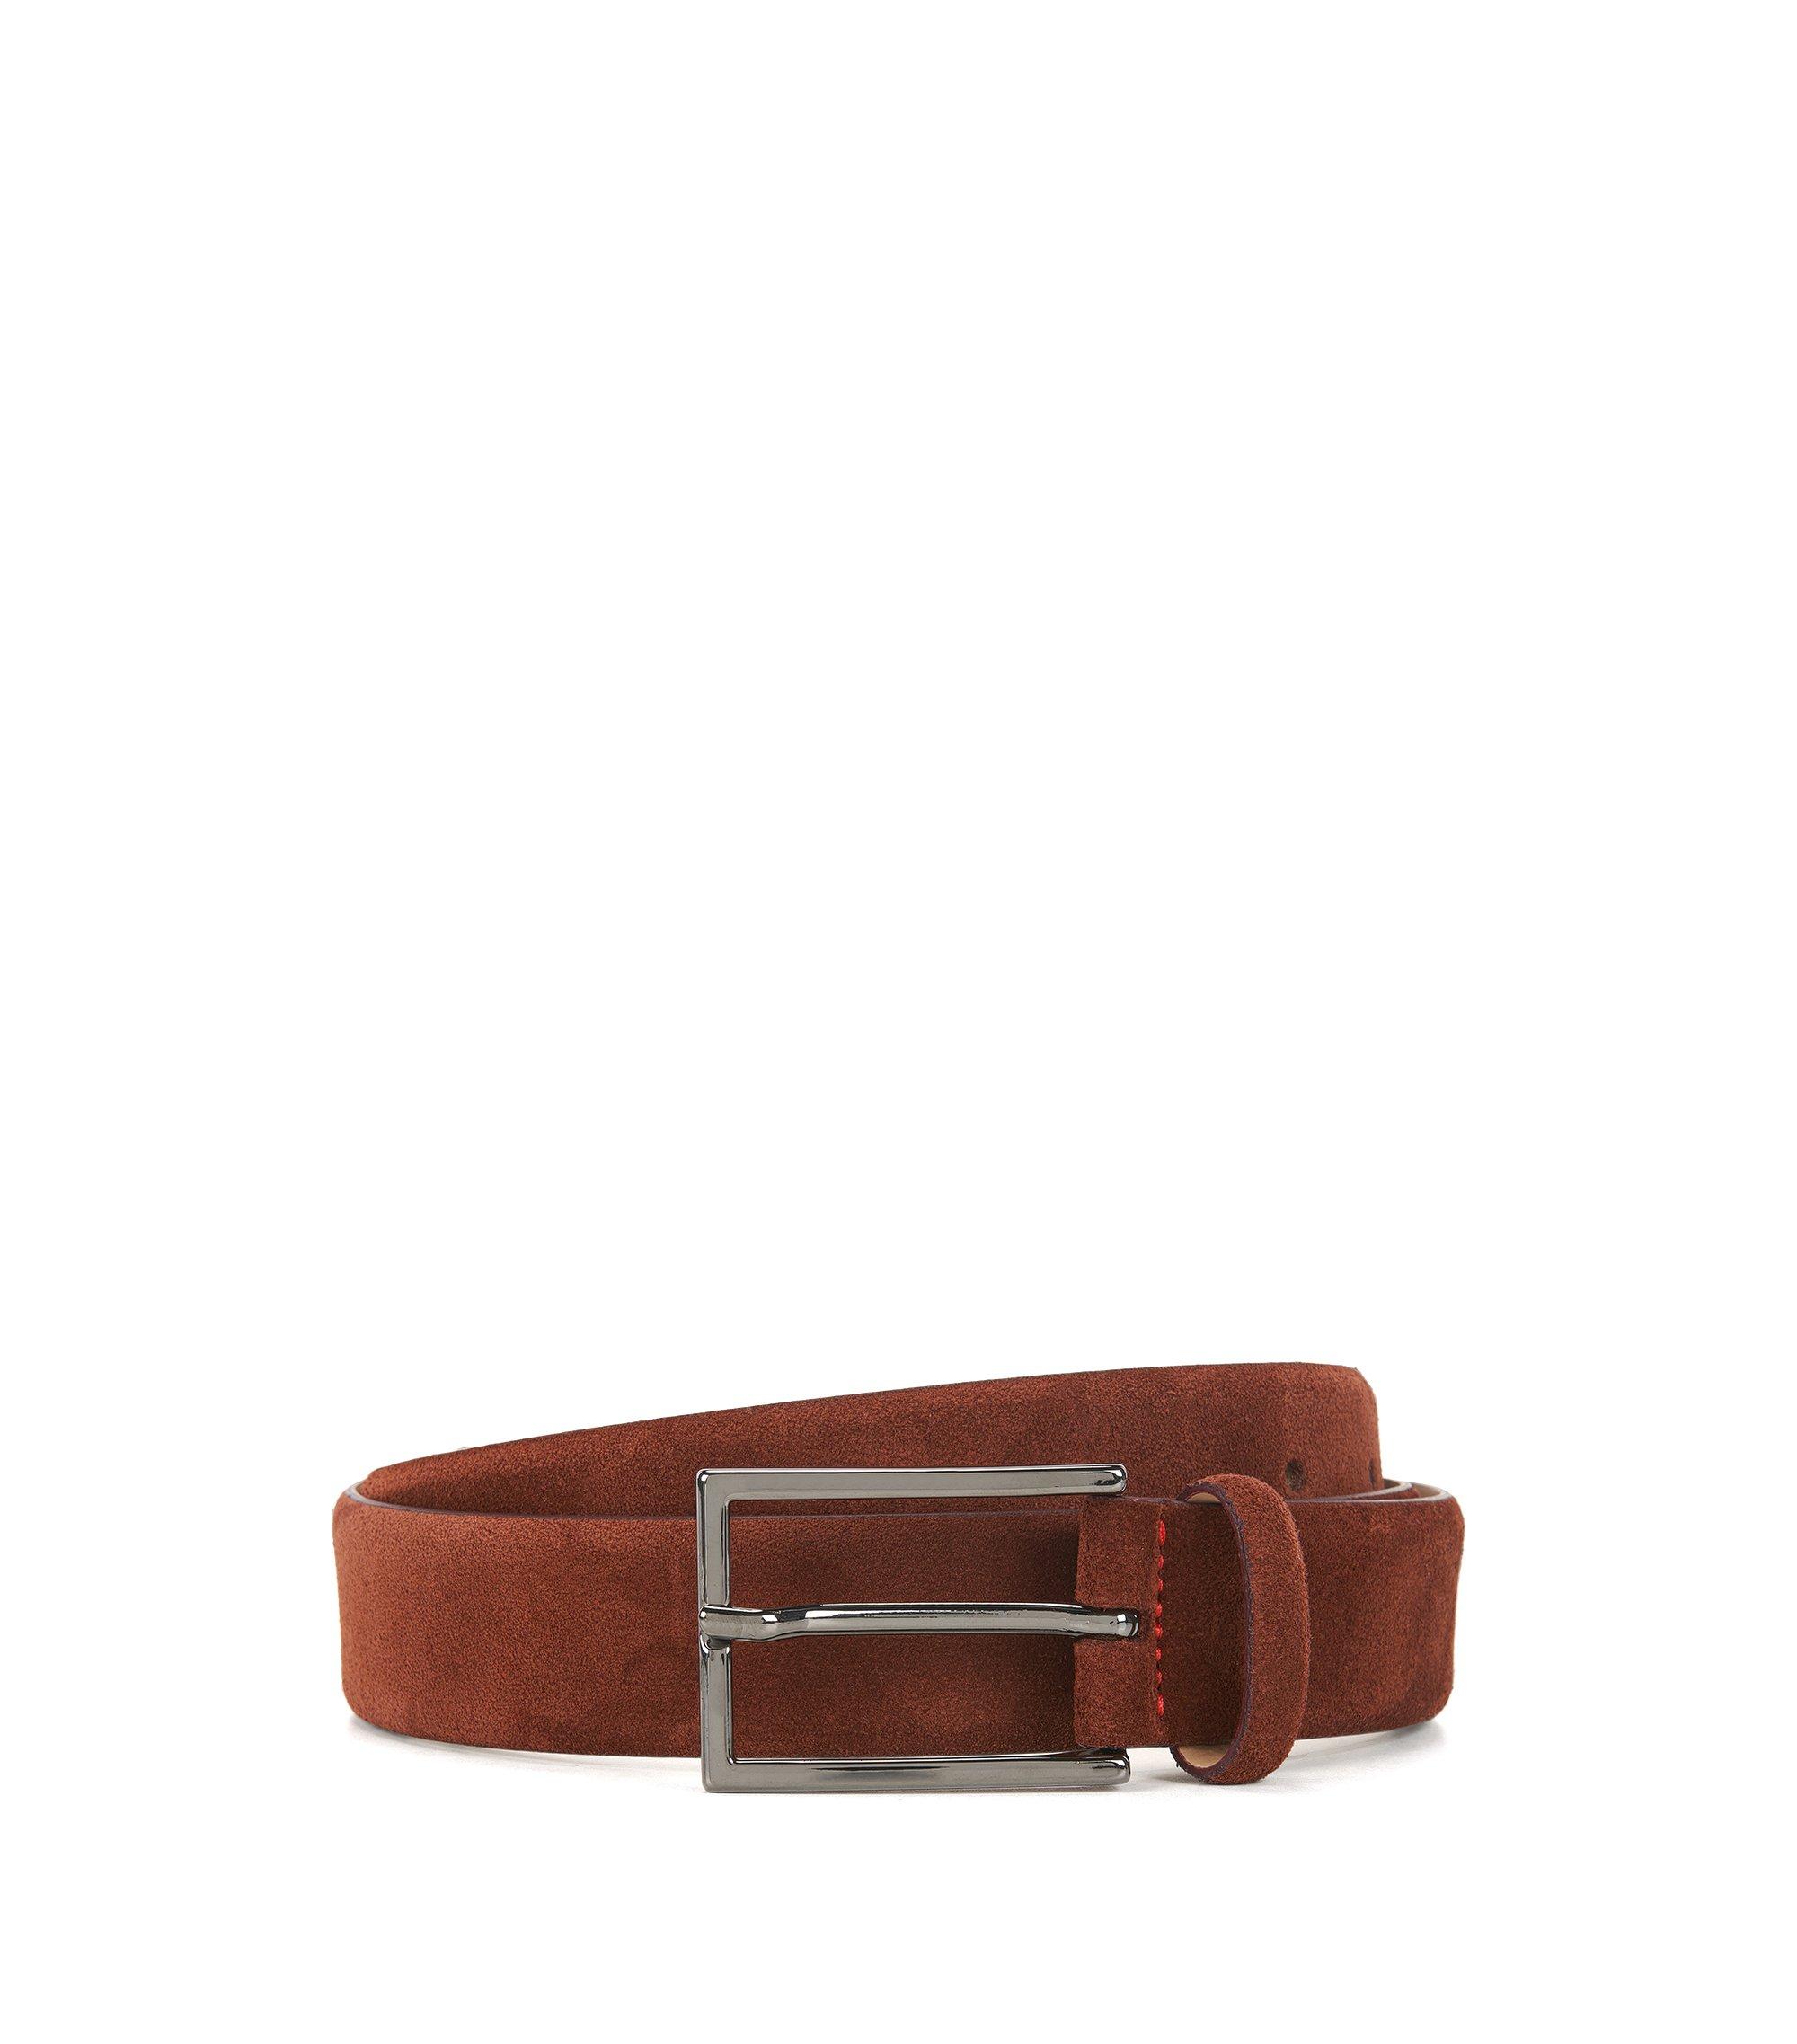 Cintura in pelle scamosciata con cucitura esclusiva, Rosso scuro